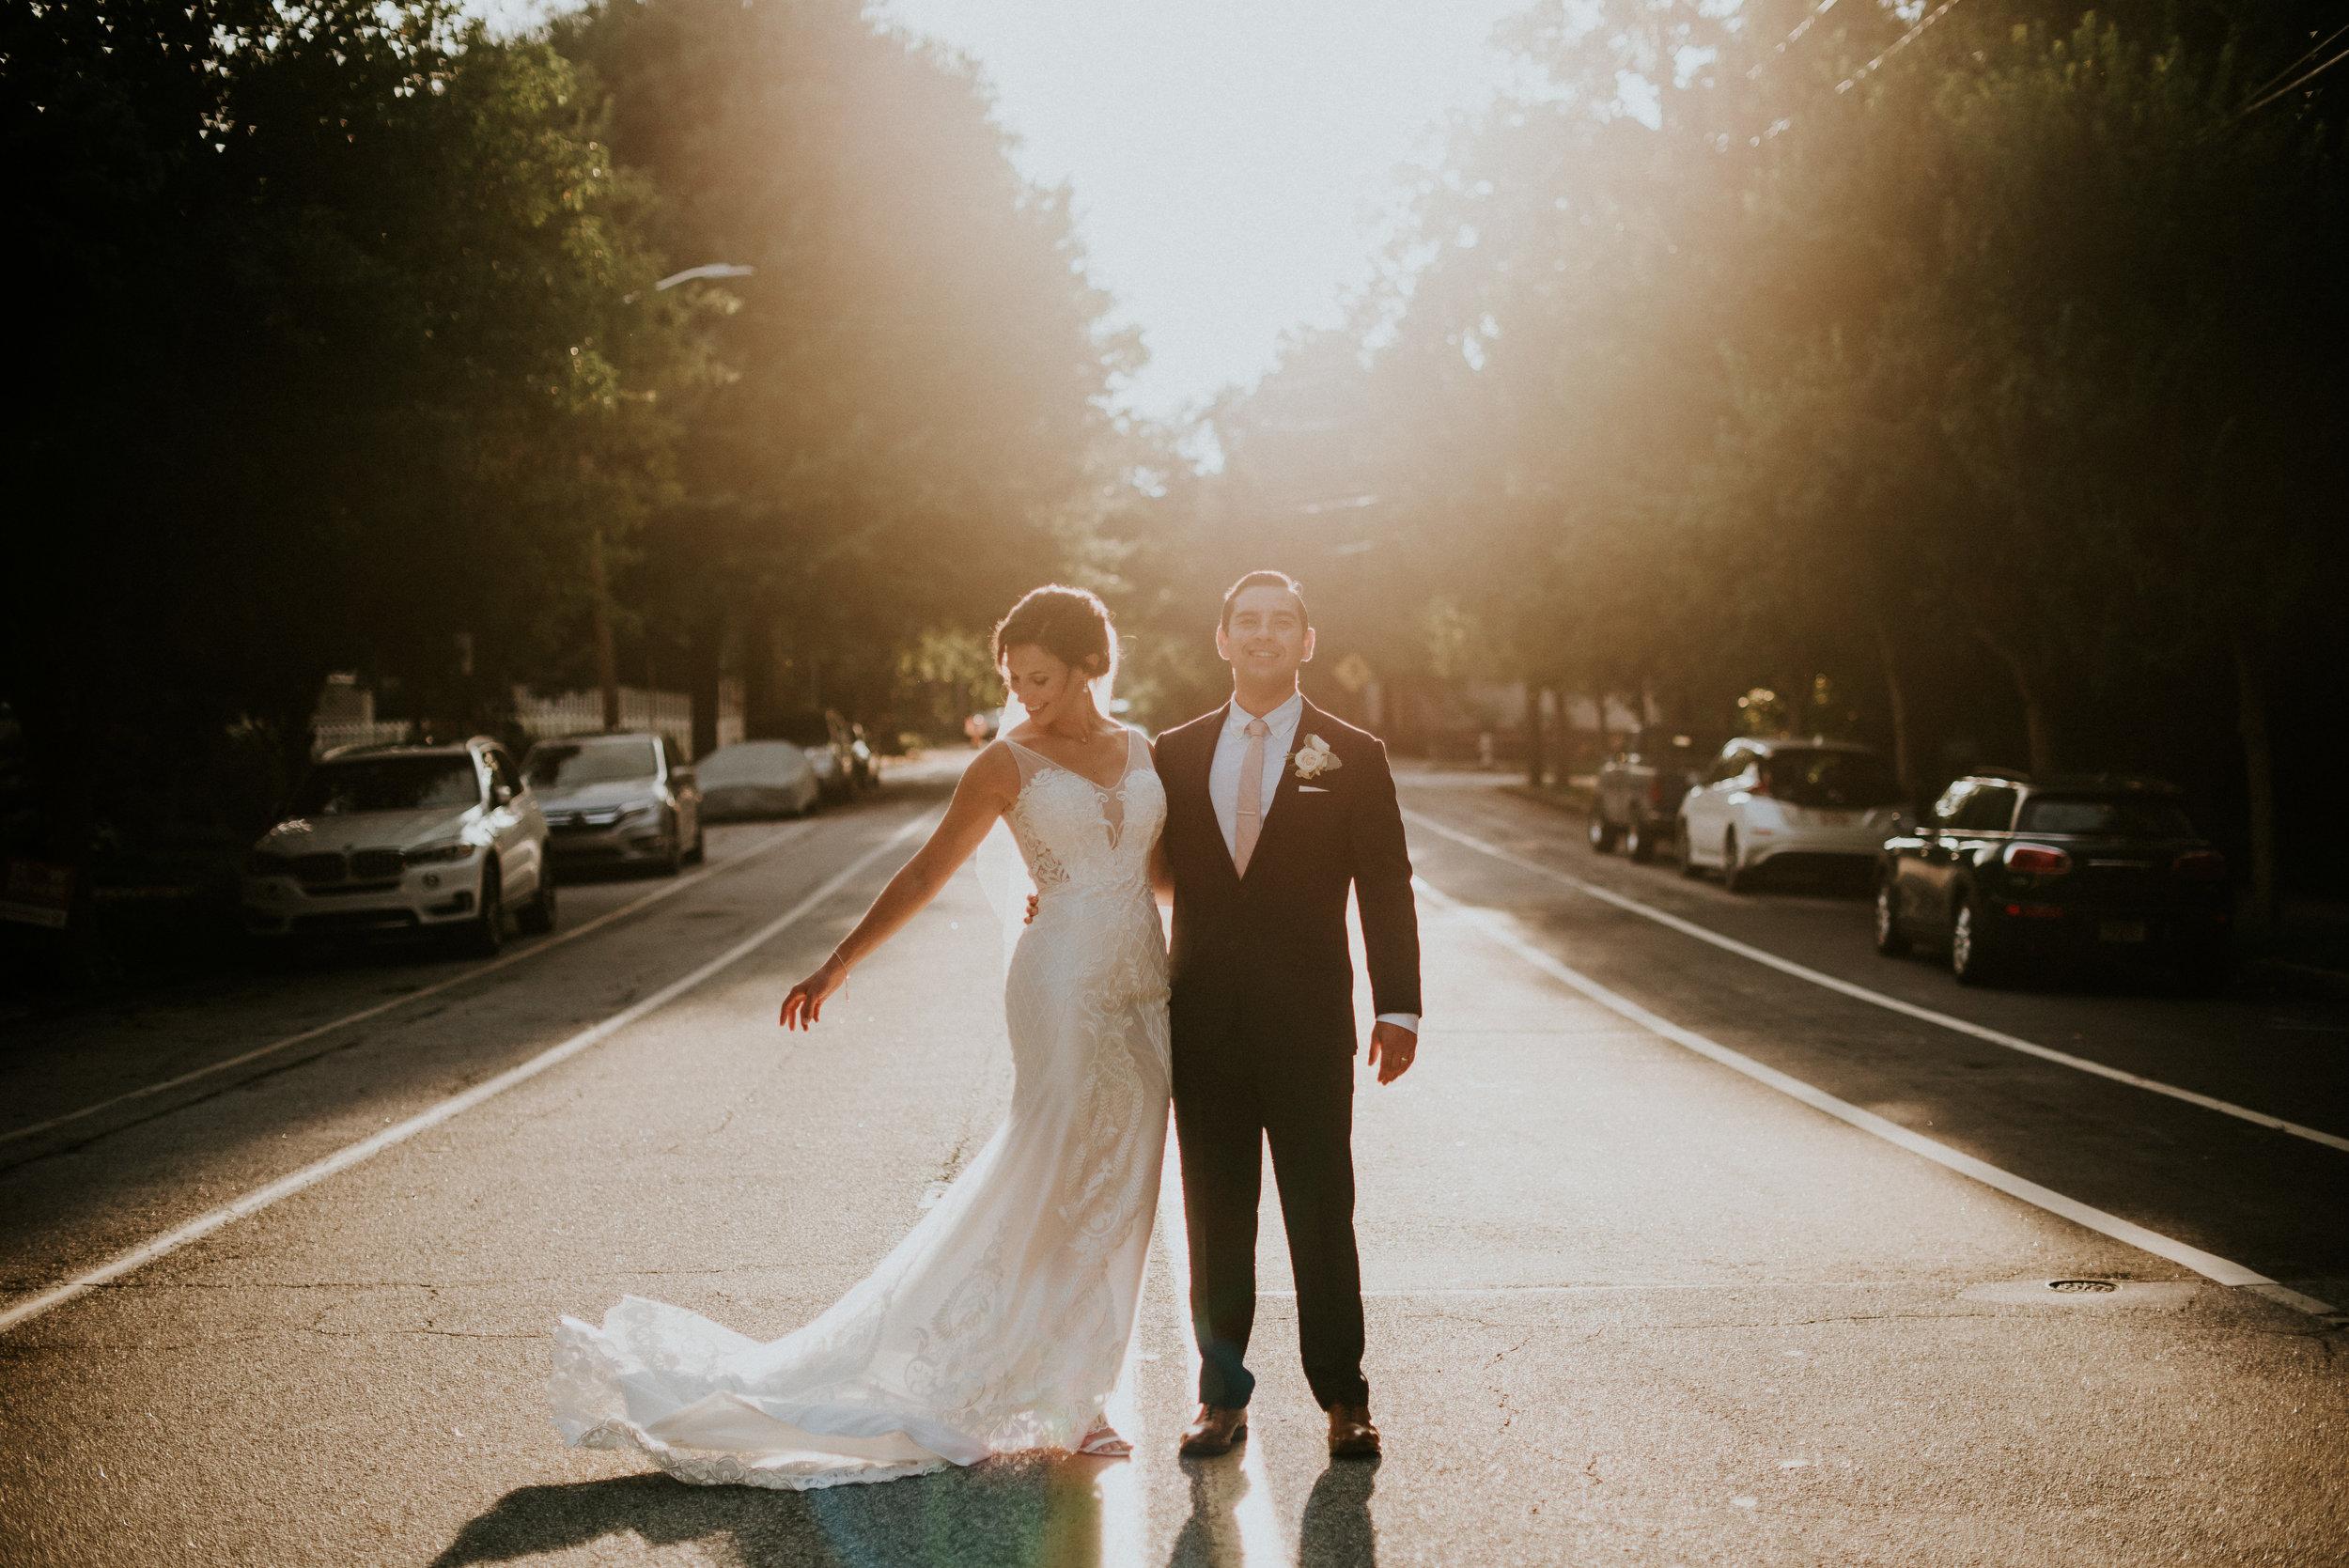 Bride and groom golden hour at The Trolley Barn wedding in Atlanta, GA